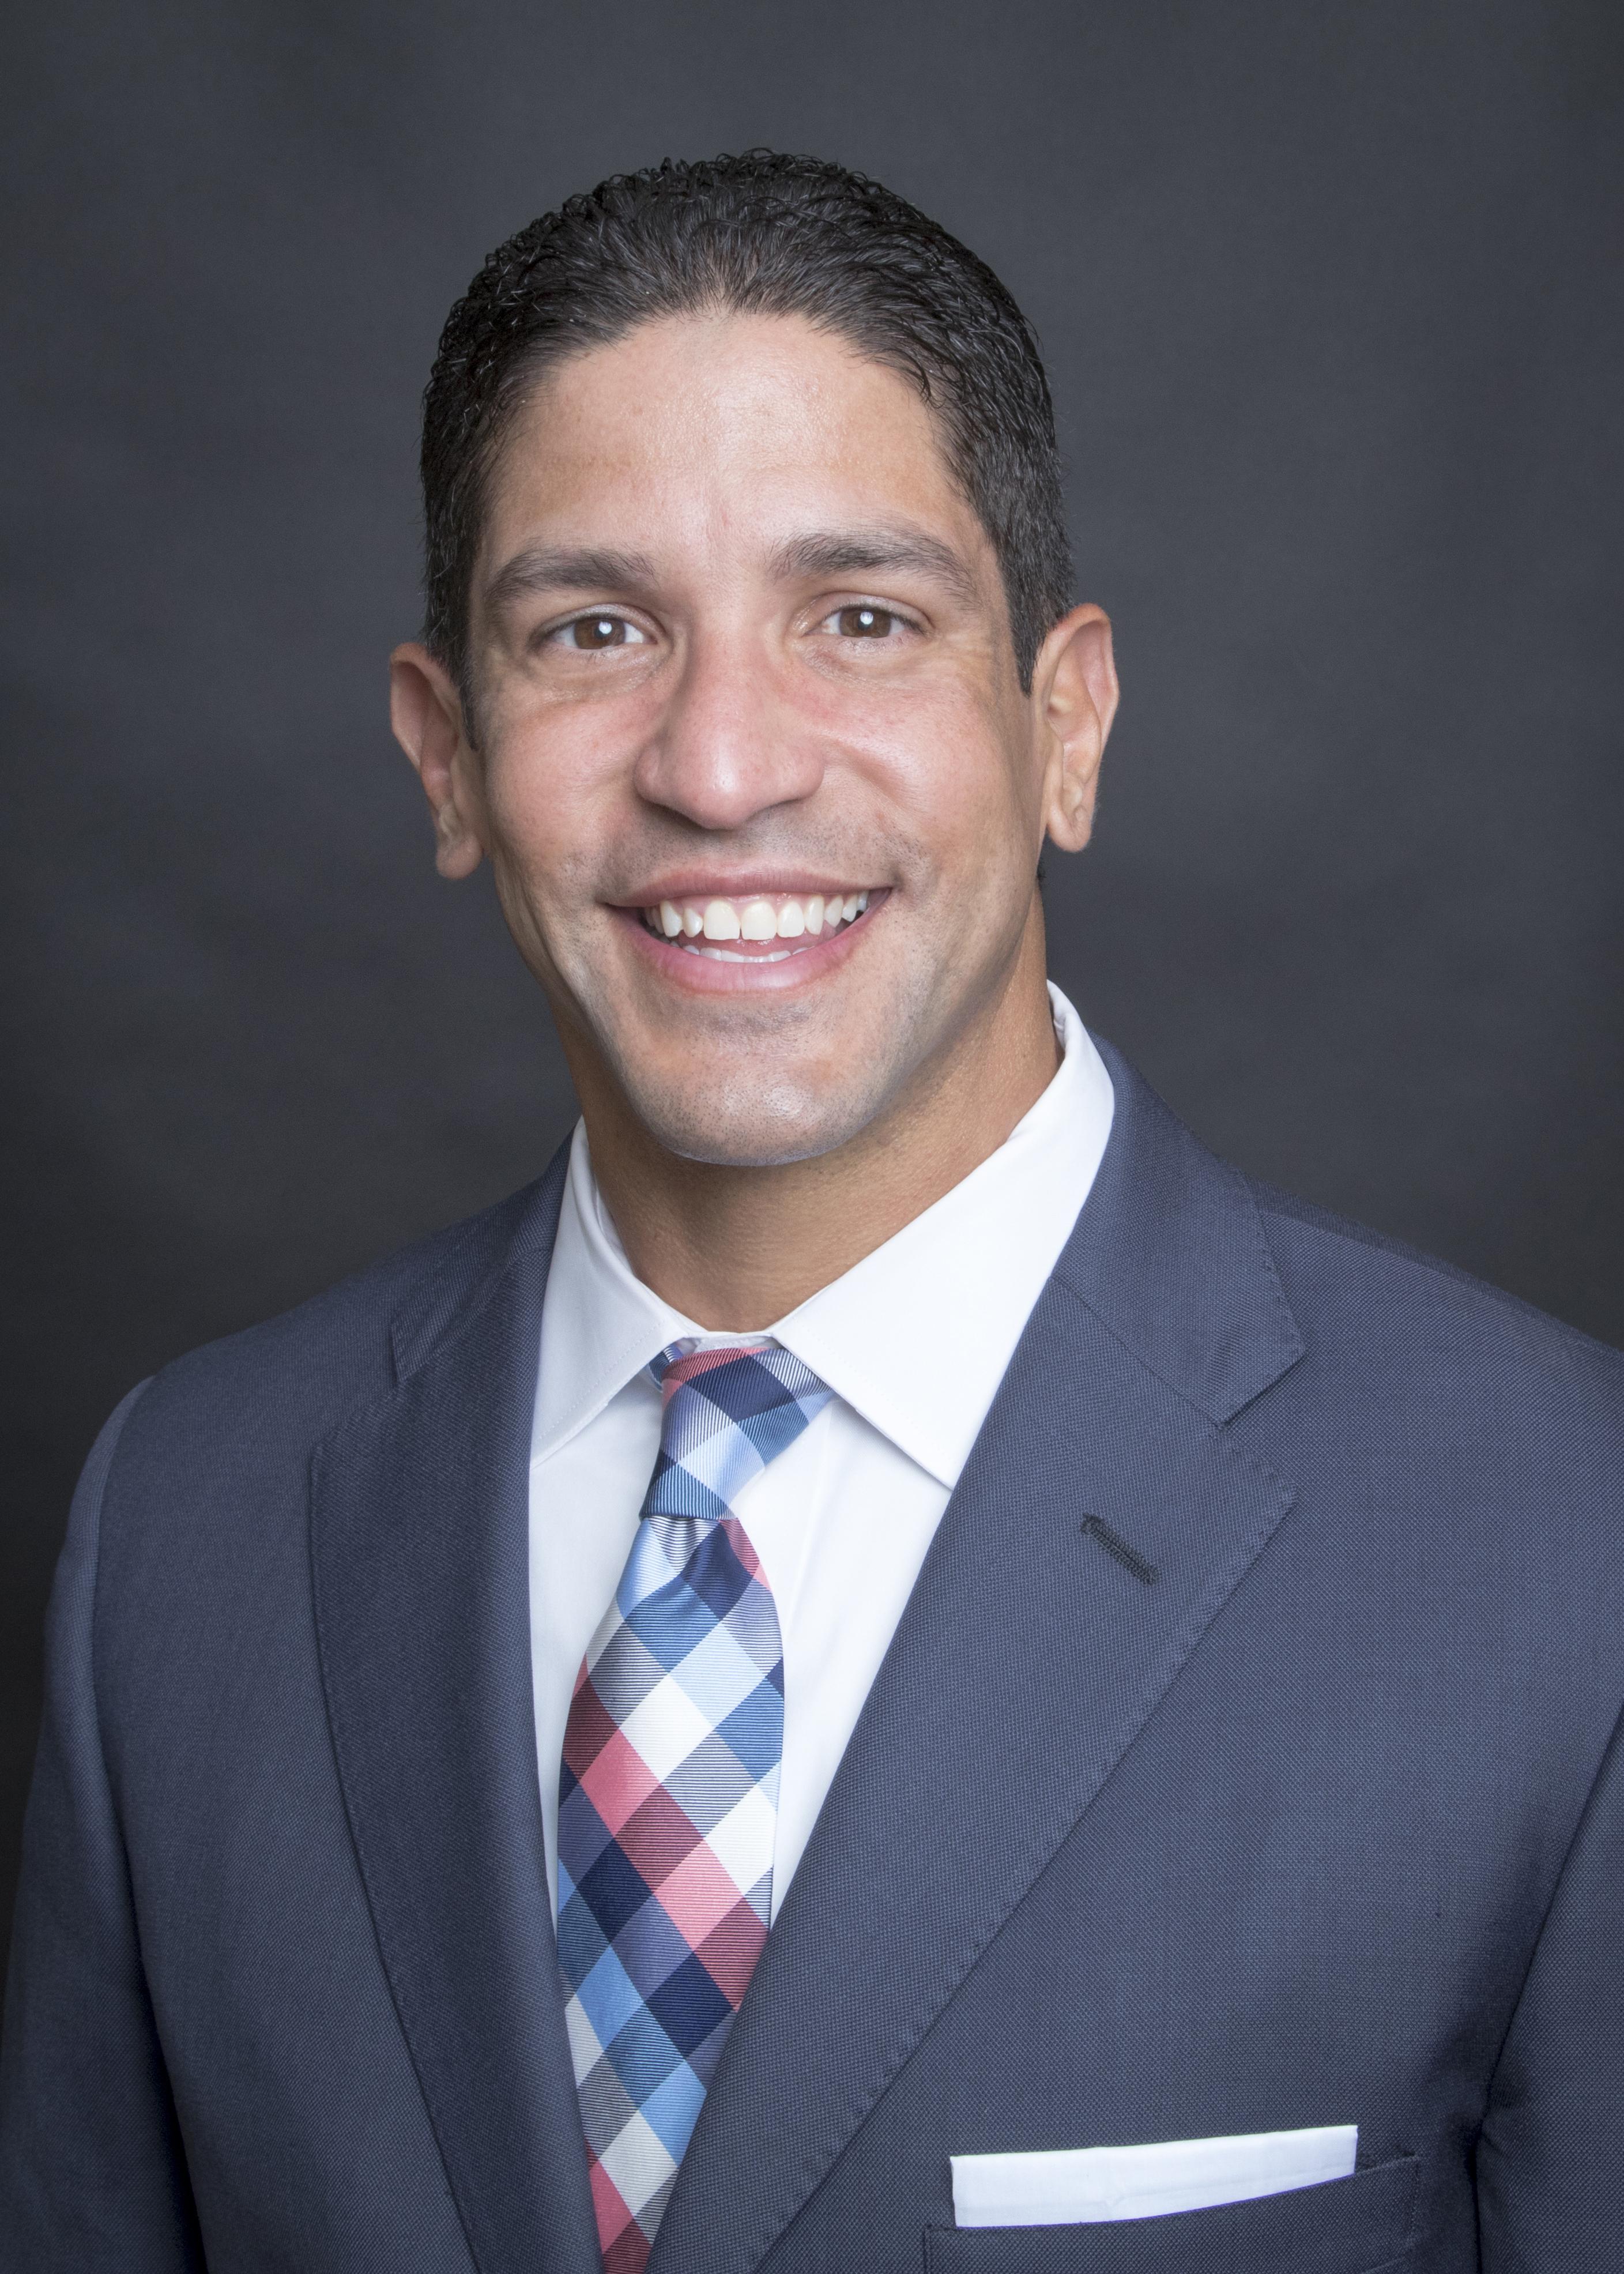 Lester Morales